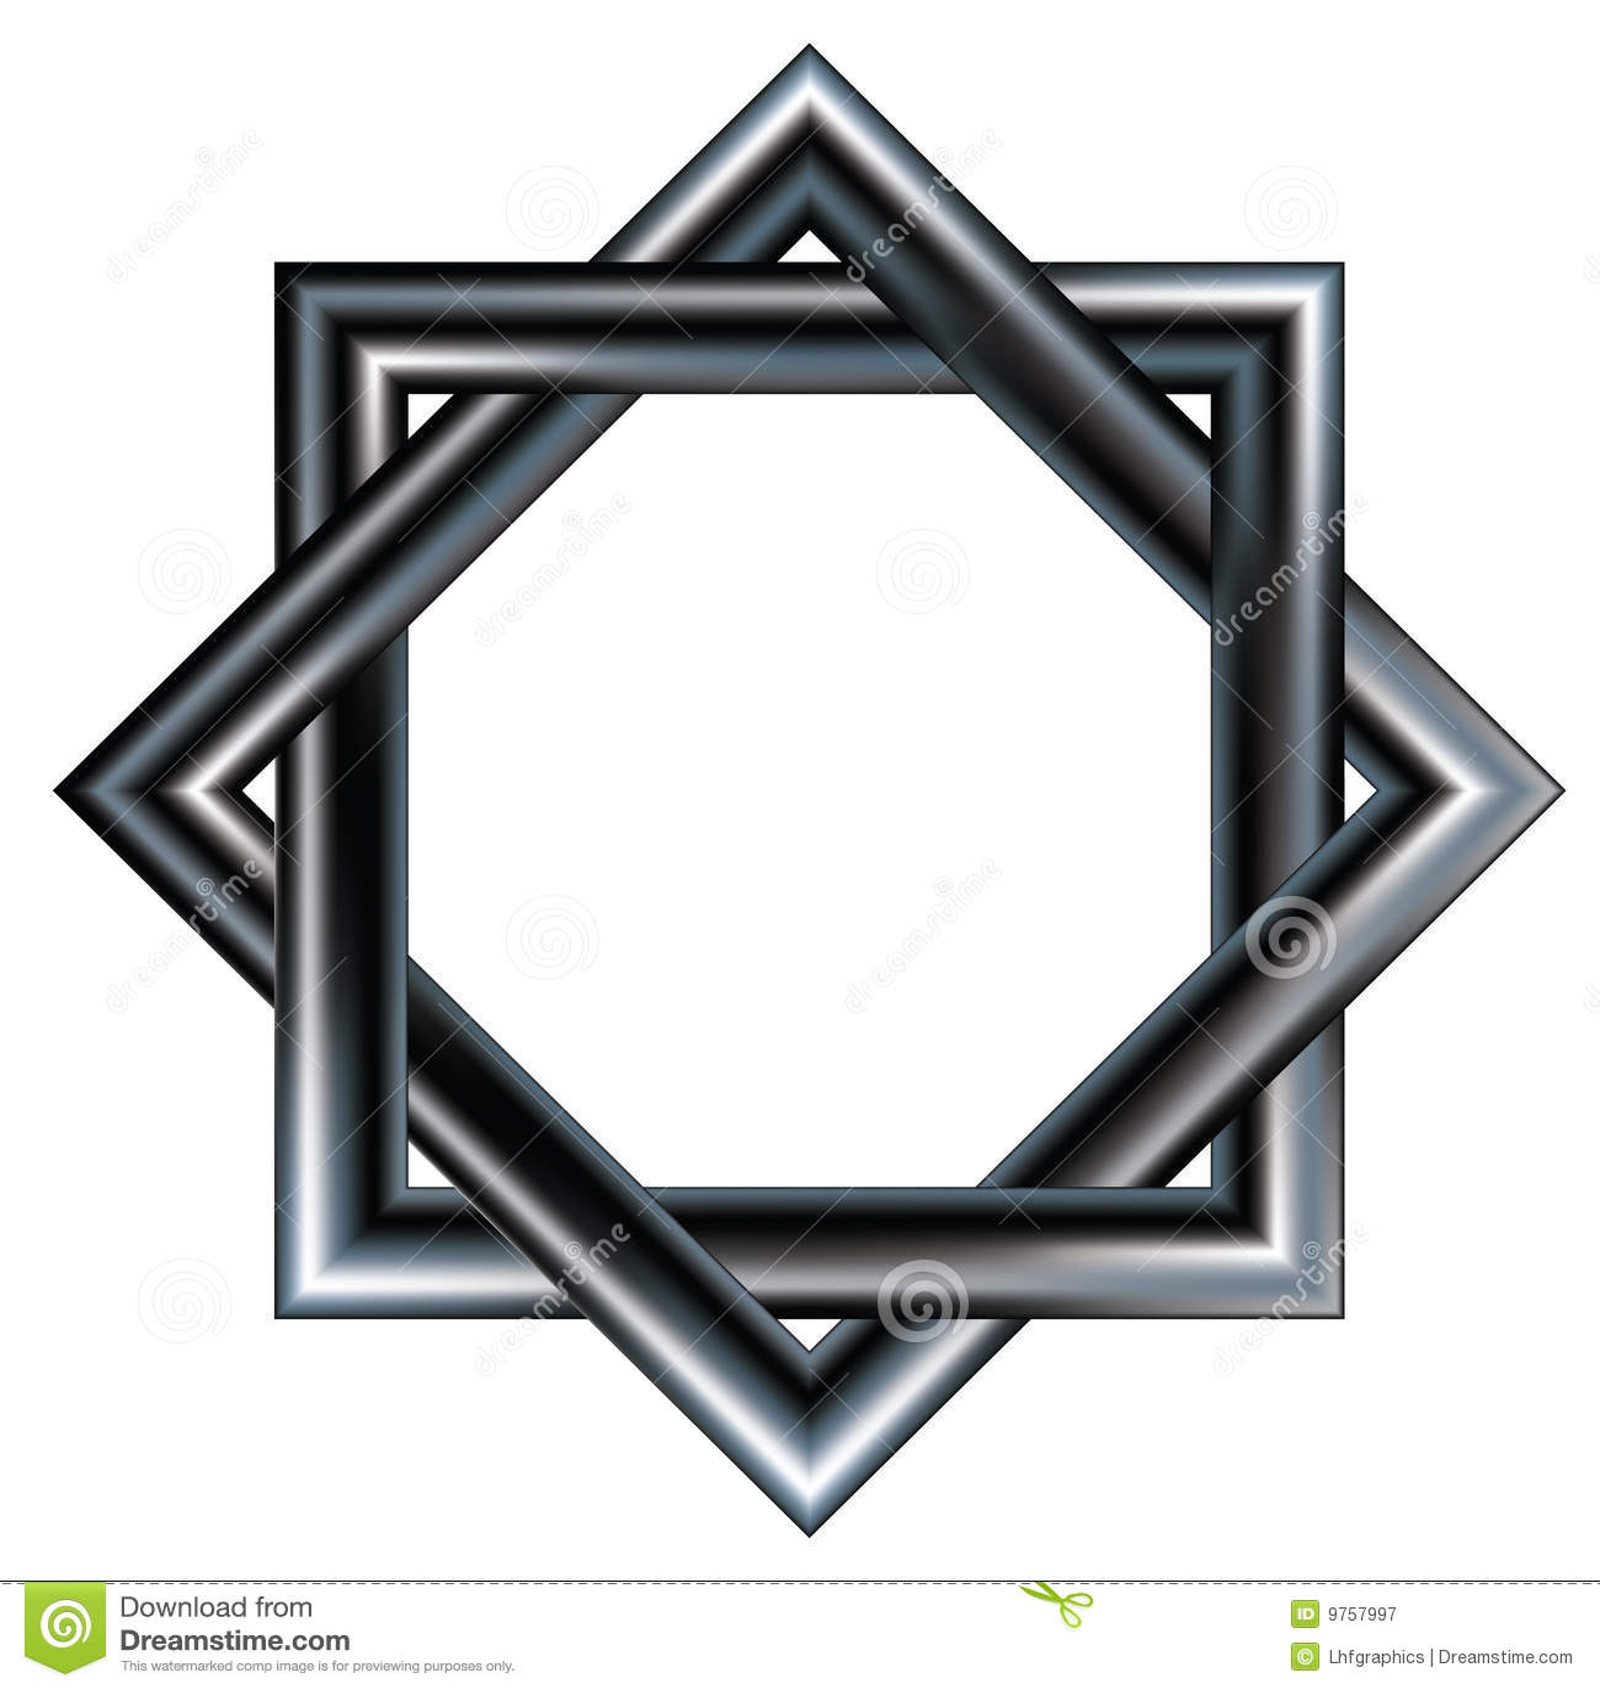 Celtic star pattern of two interlocking squares stock vector celtic star pattern of two interlocking squares buycottarizona